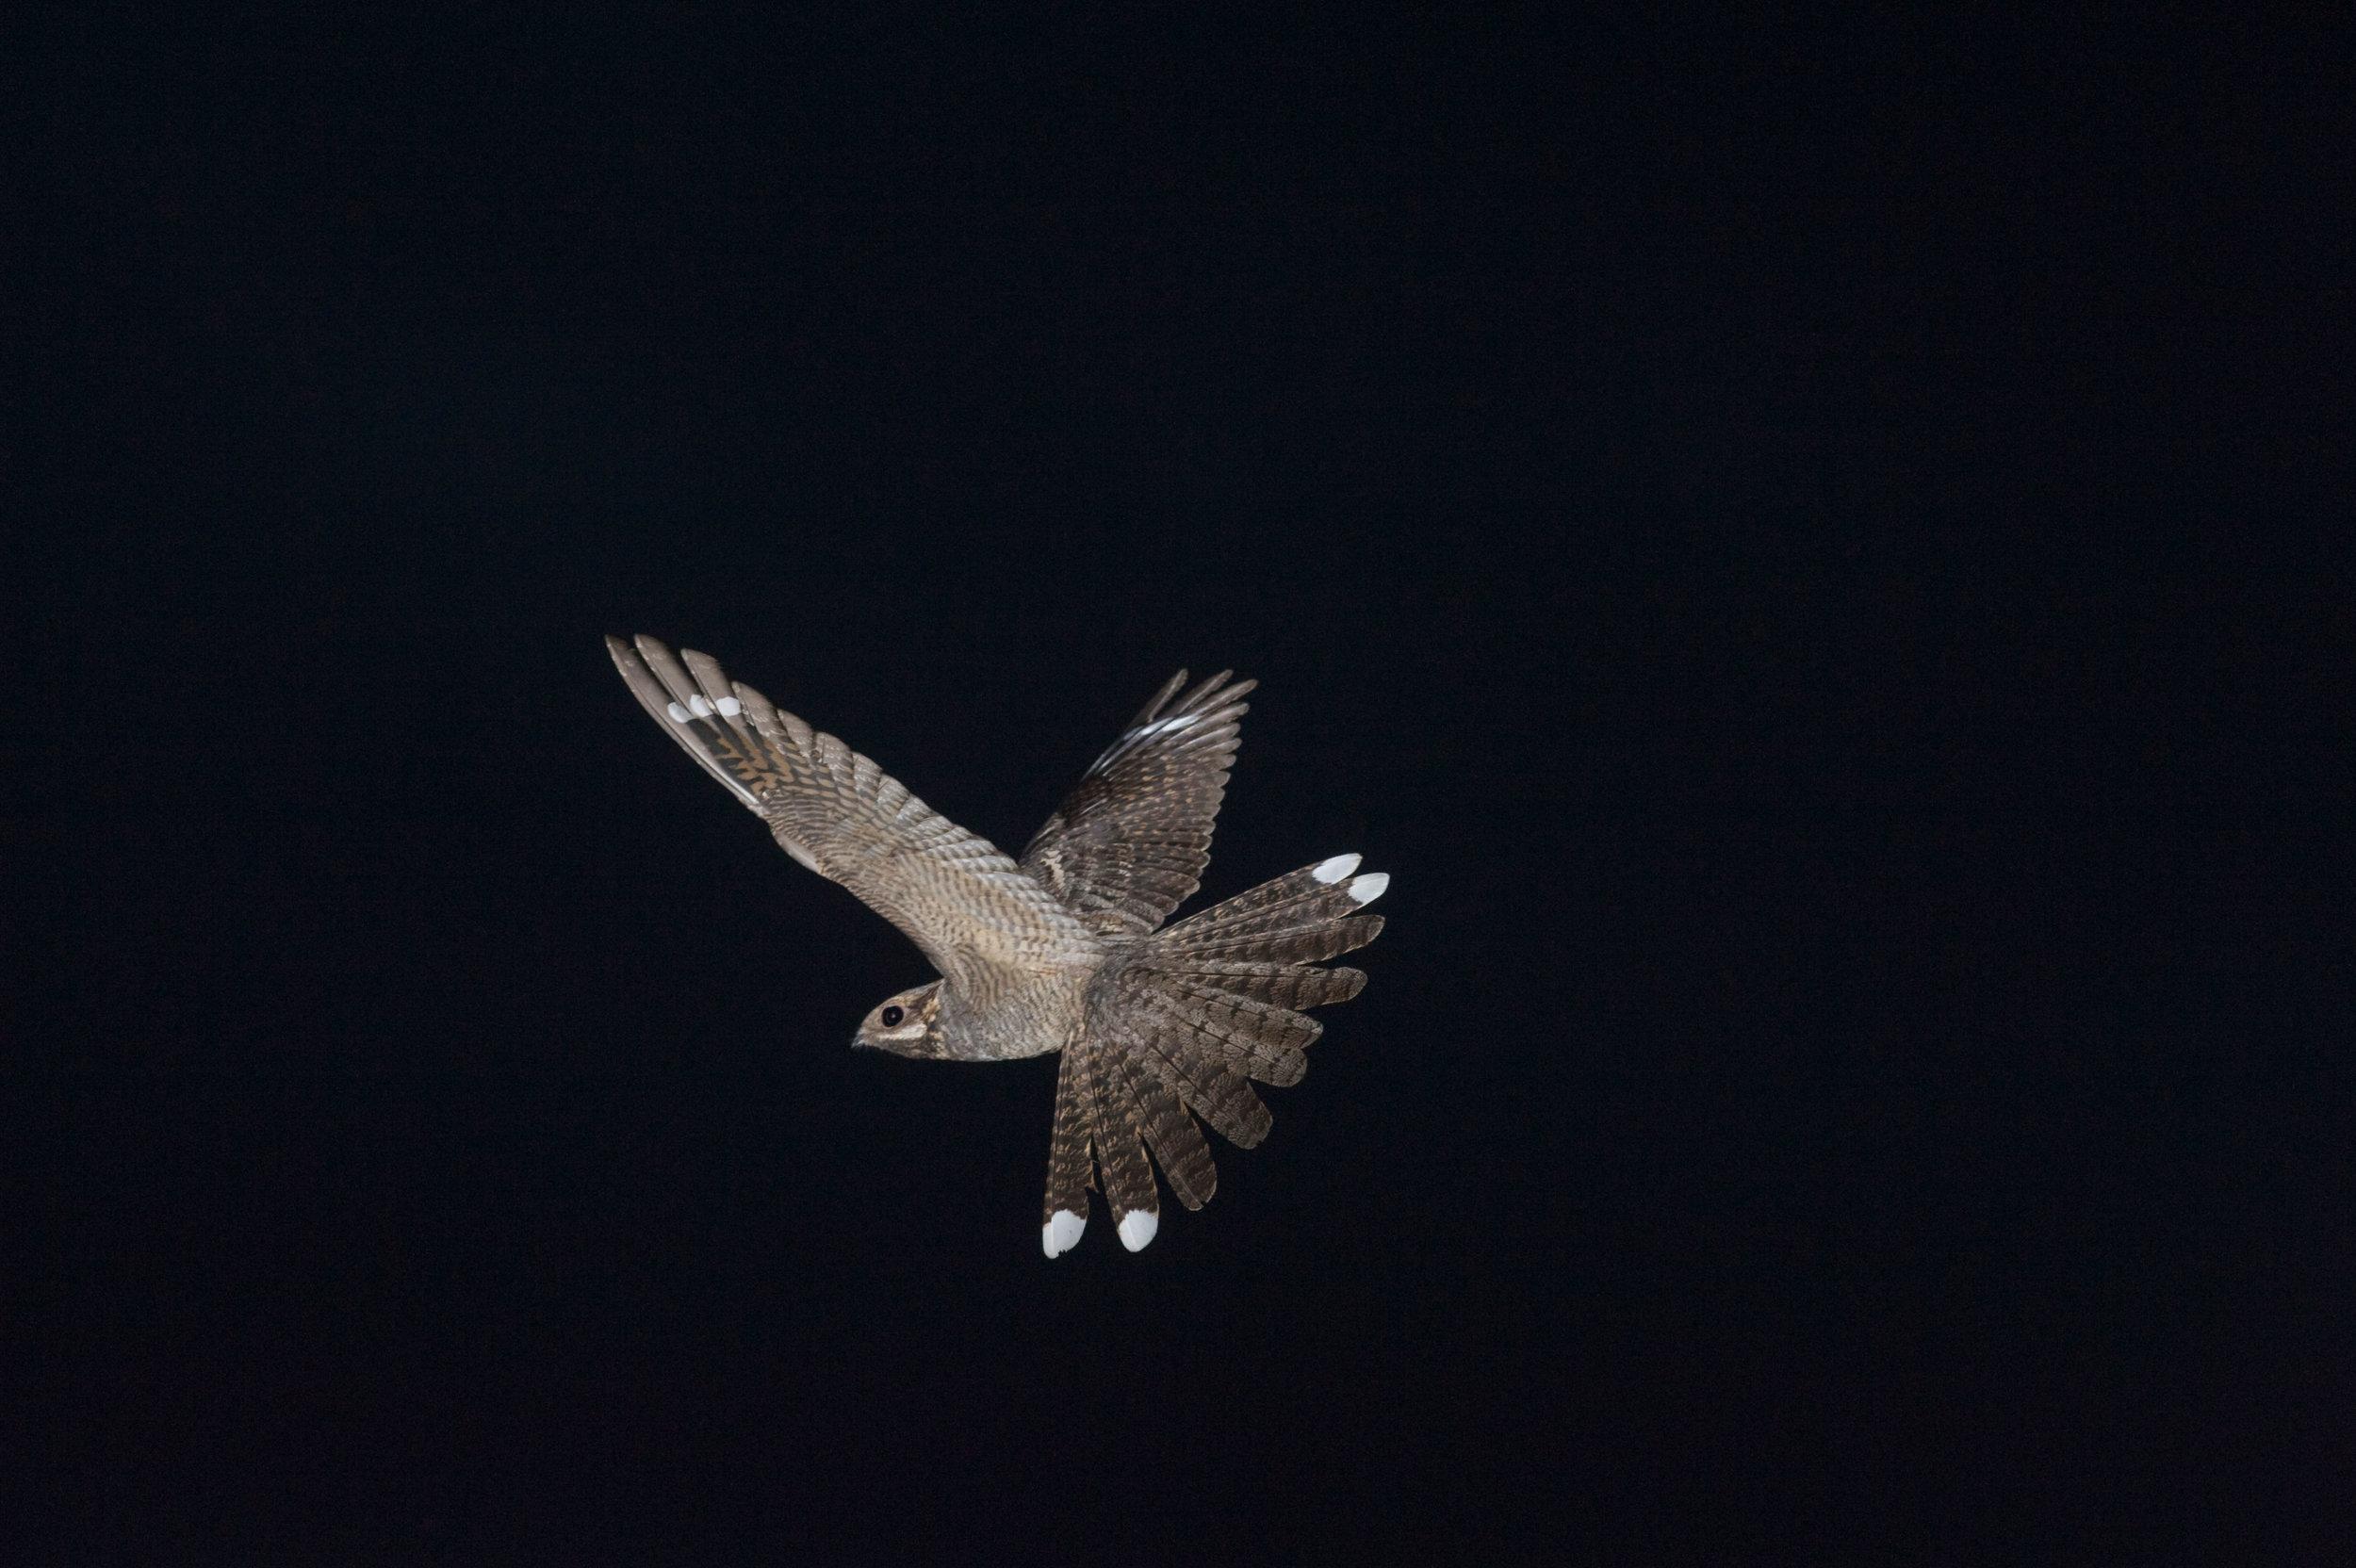 Male Nightjar